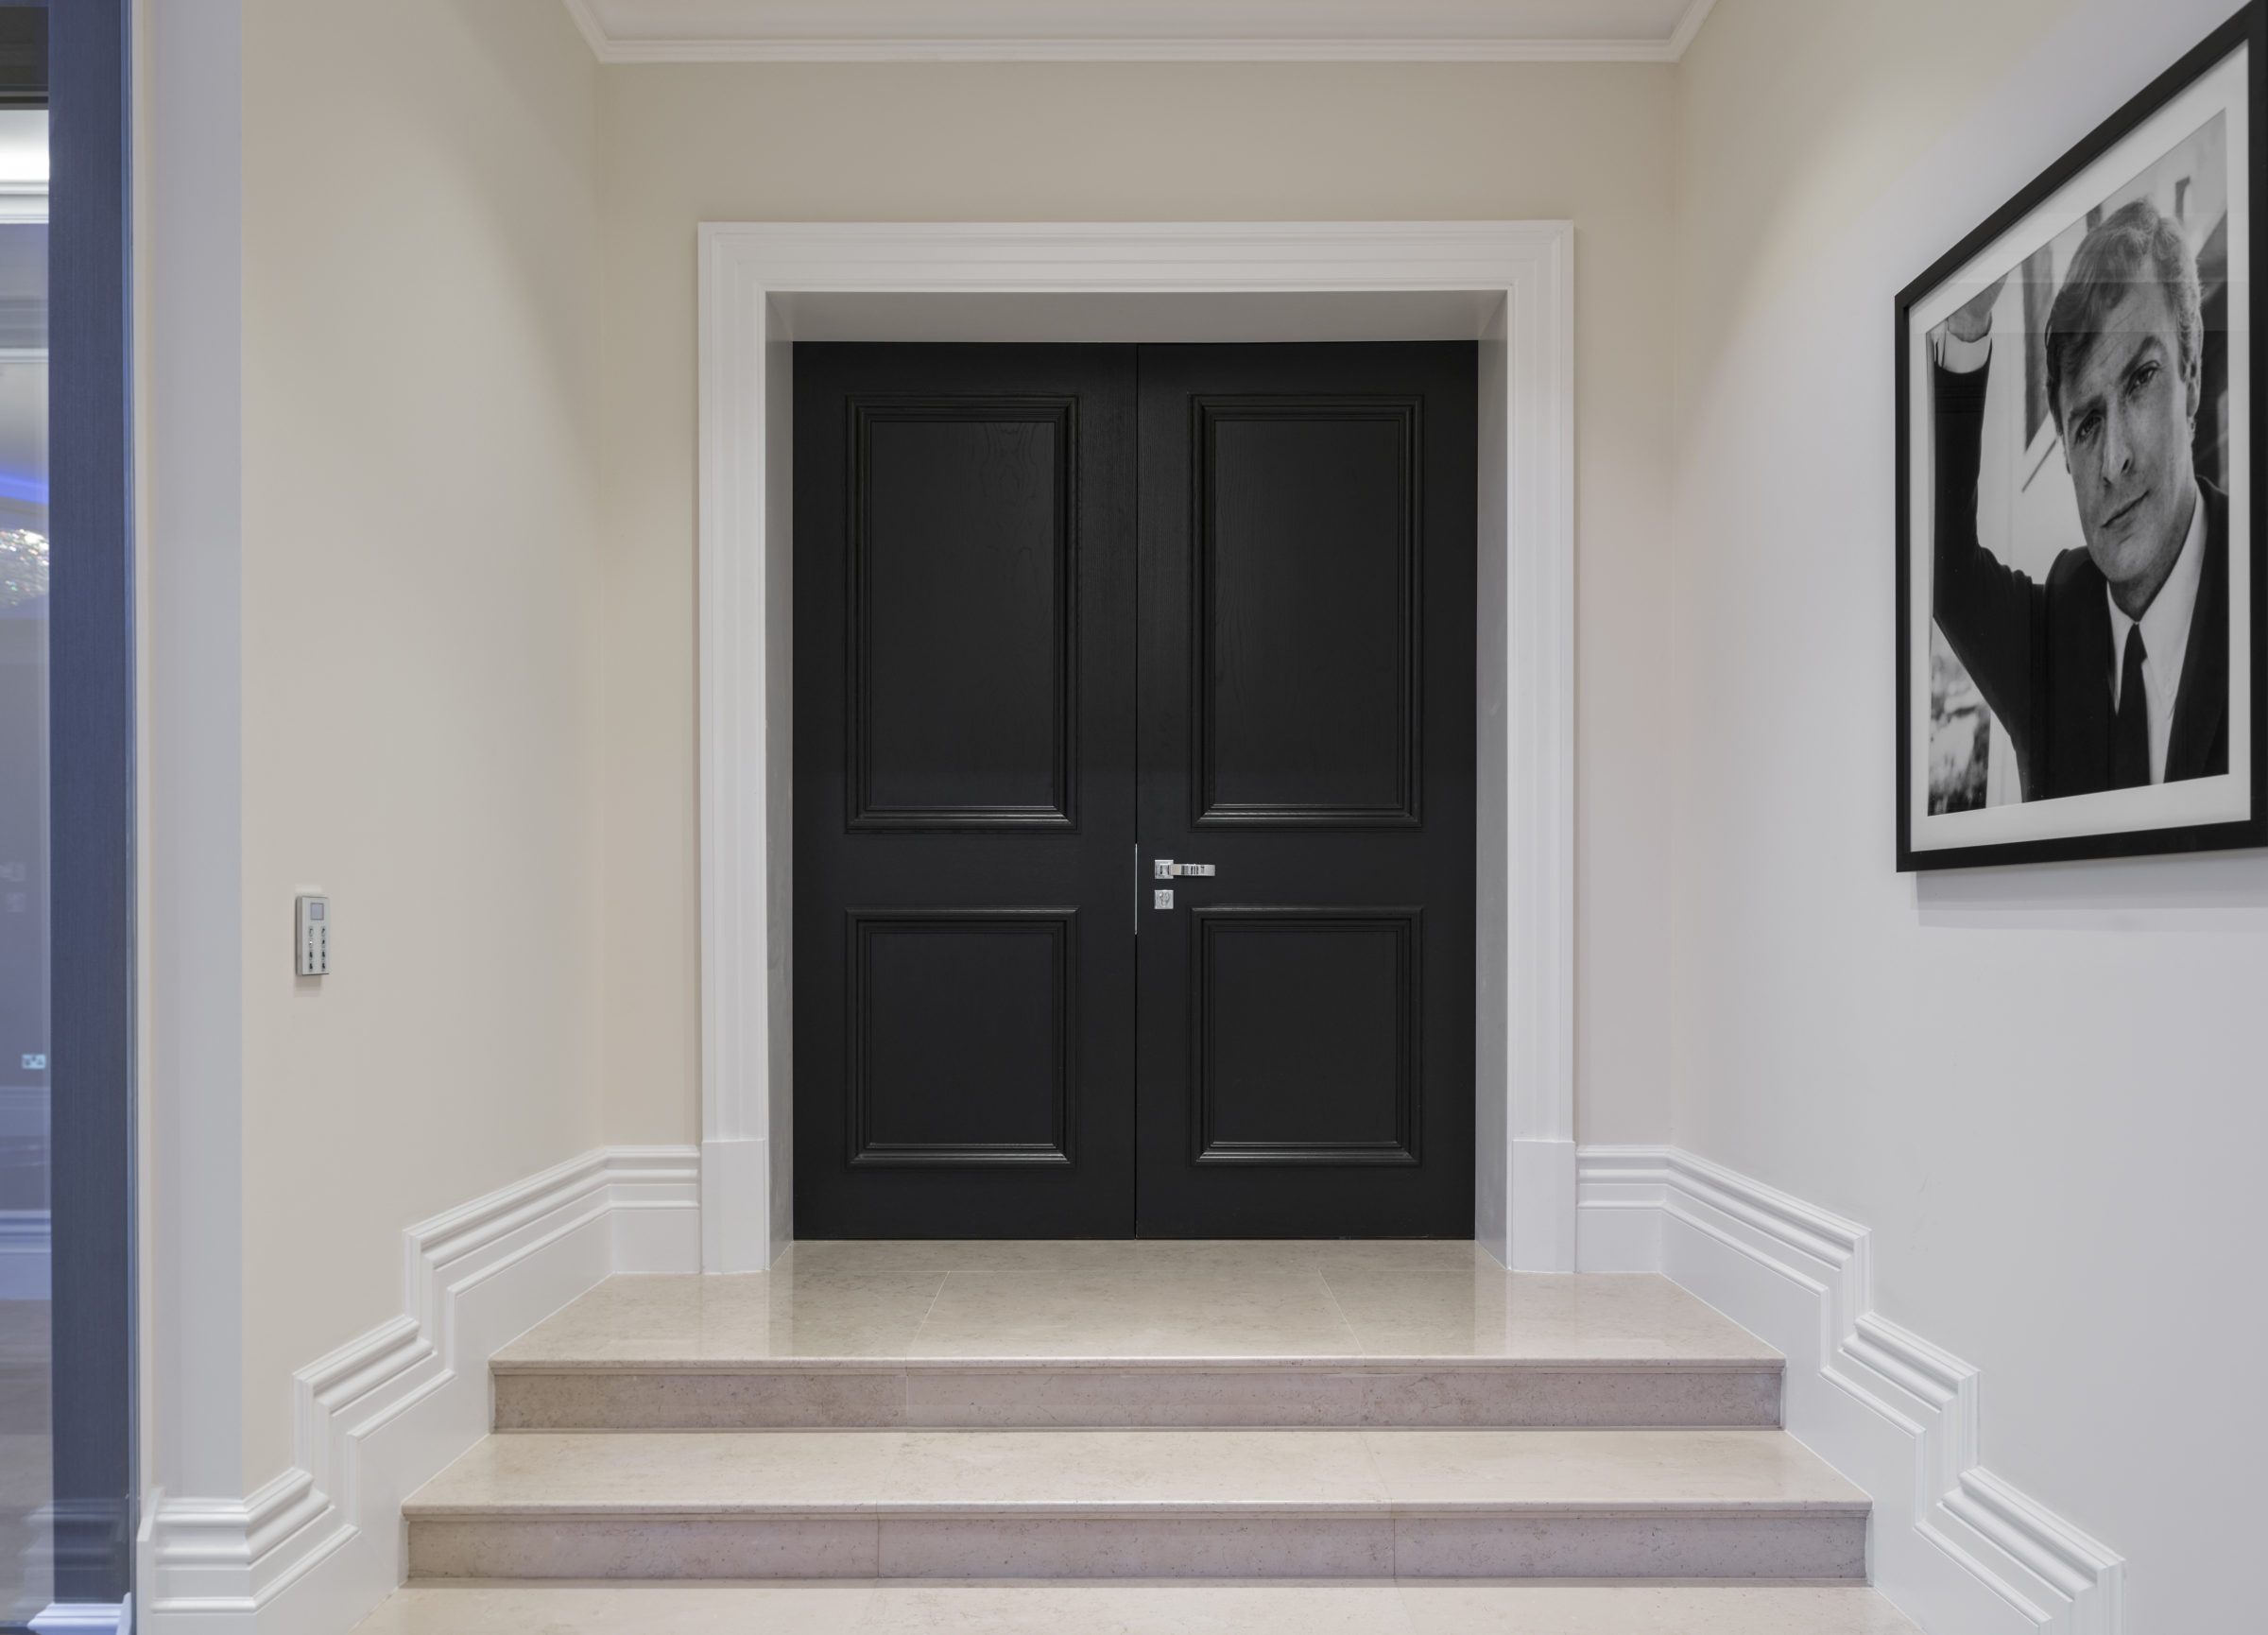 Panel doors – Ahmarra's modern take on an elegant classic